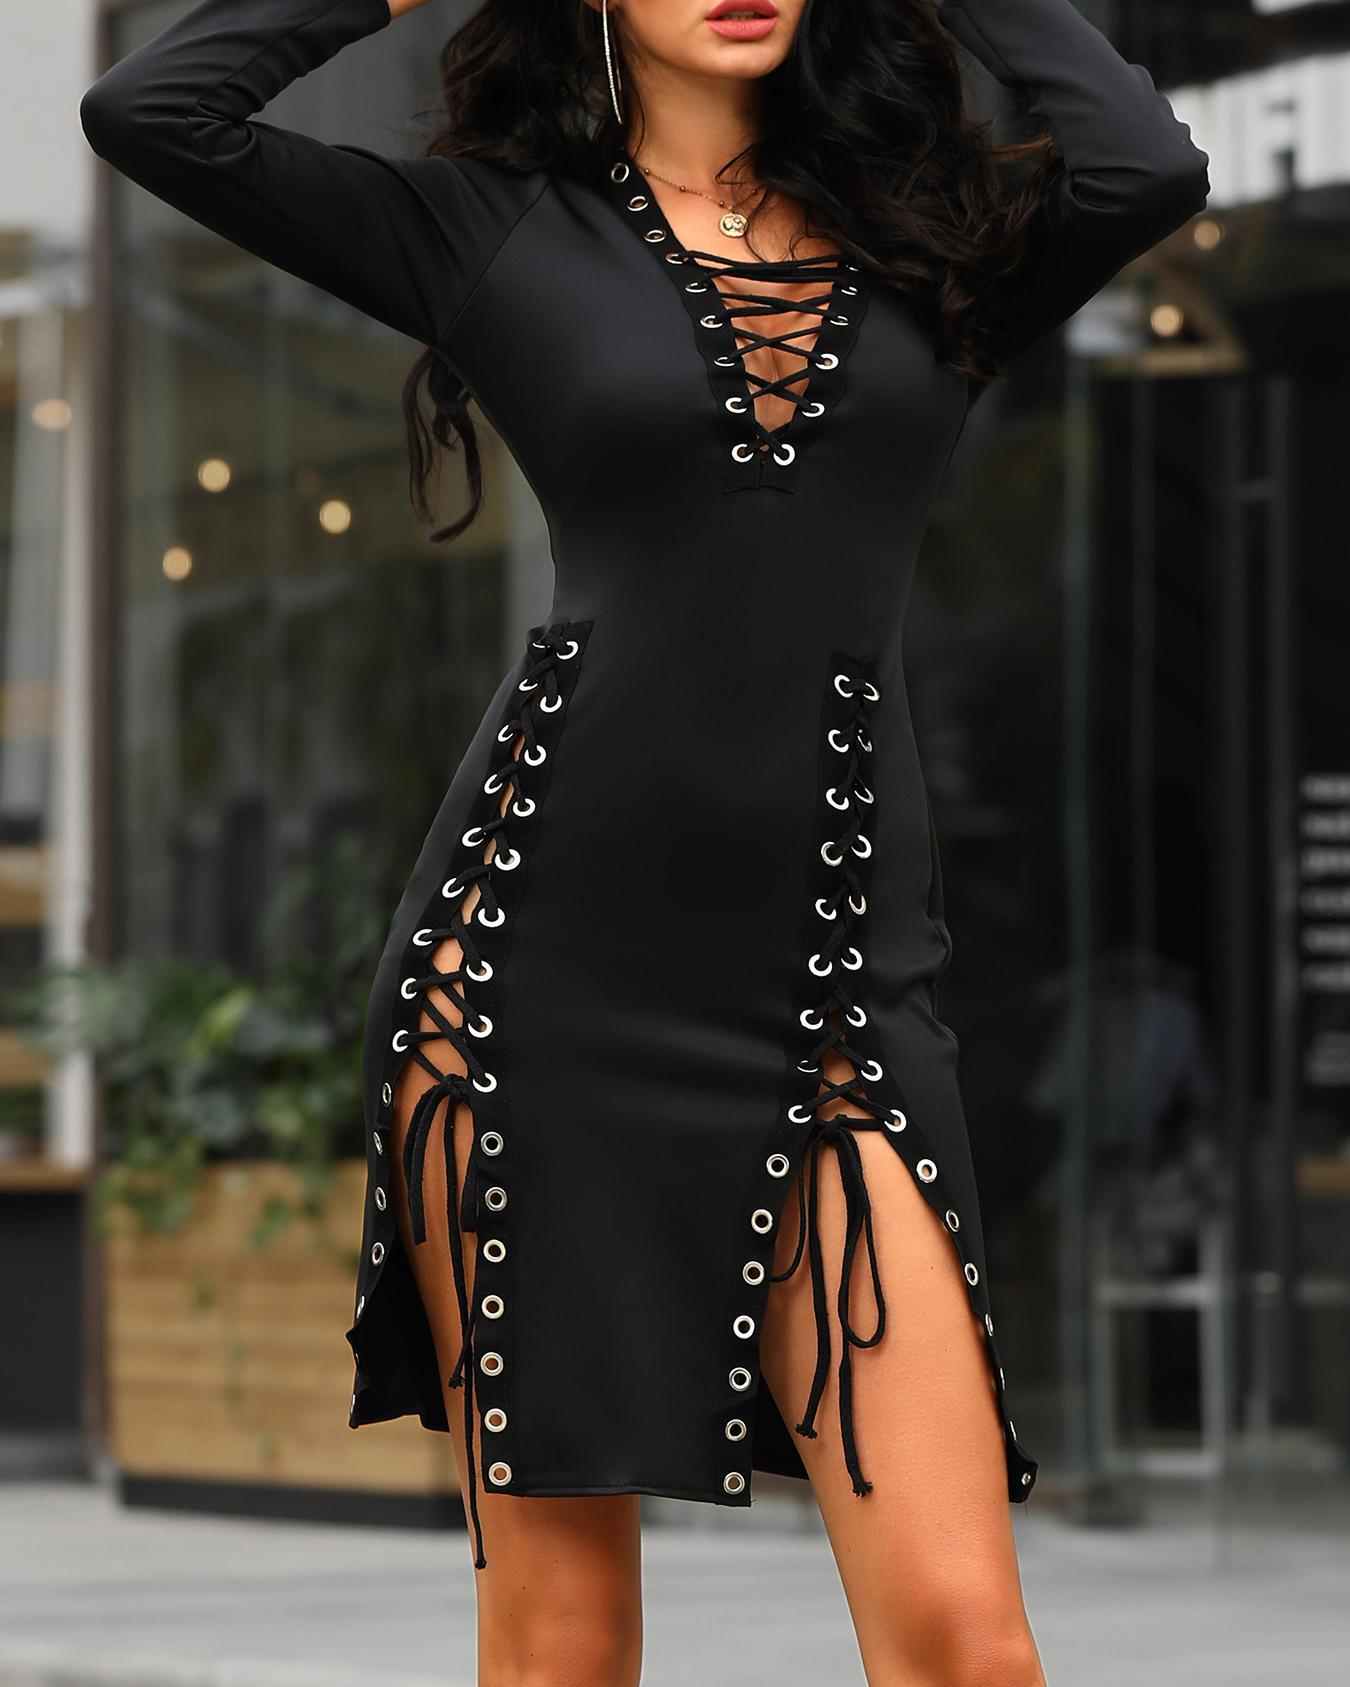 Sexy Lace Up Irregular Plunged Dress